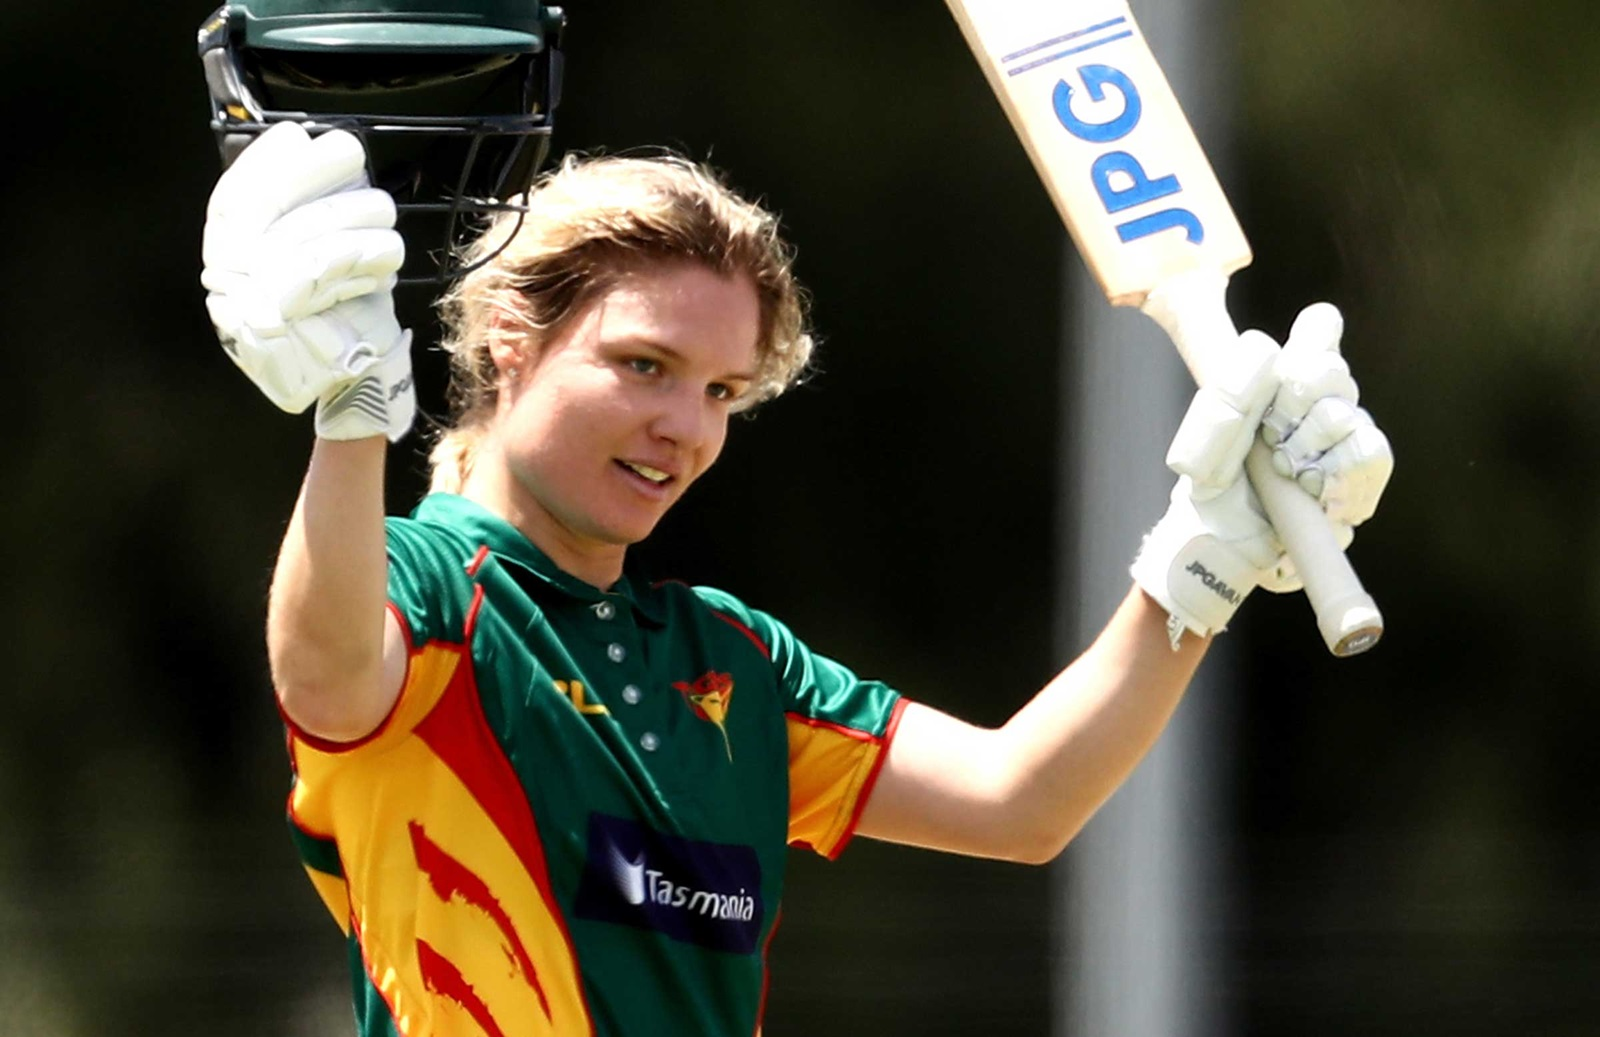 Carey's milestone knock adds to Aussie abundance of riches - cricket.com.au